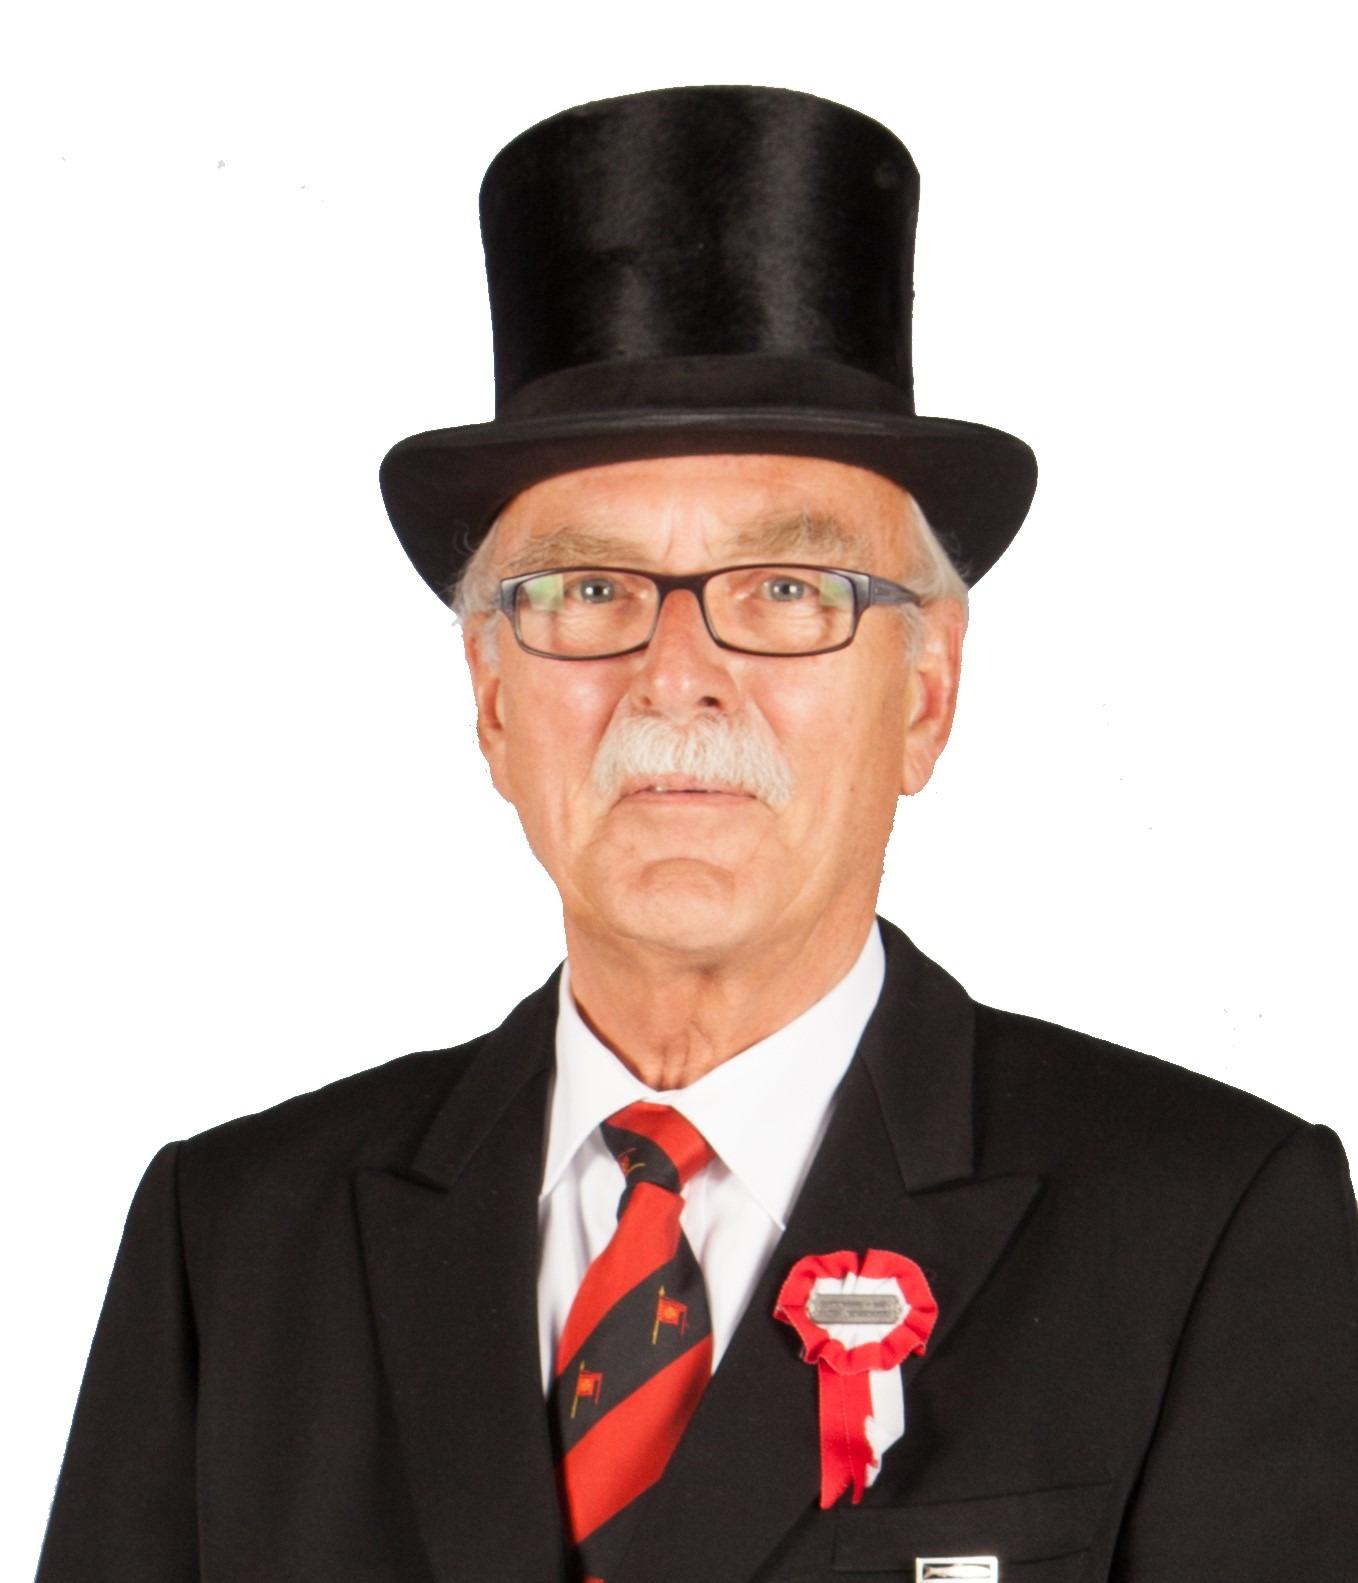 Rutger Veldhuyzen van Zanten ere-commissaris